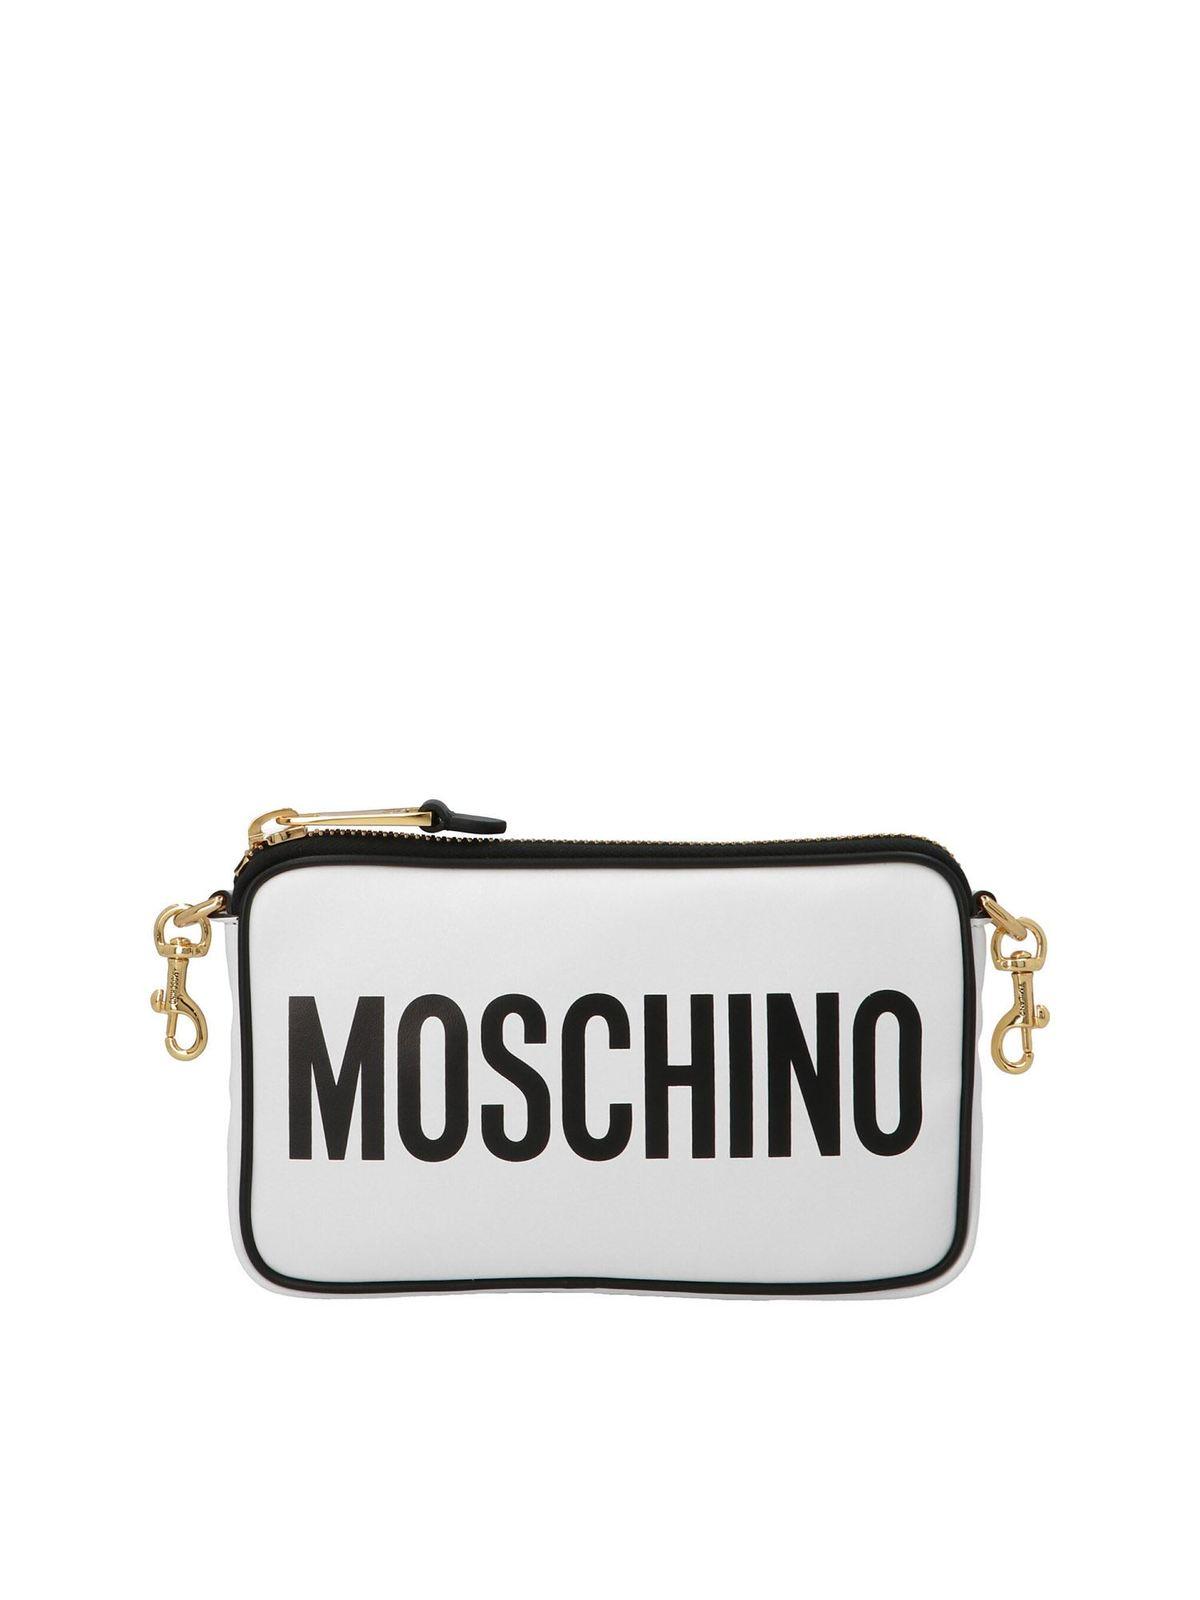 MOSCHINO LOGO SHOULDER BAG IN WHITE